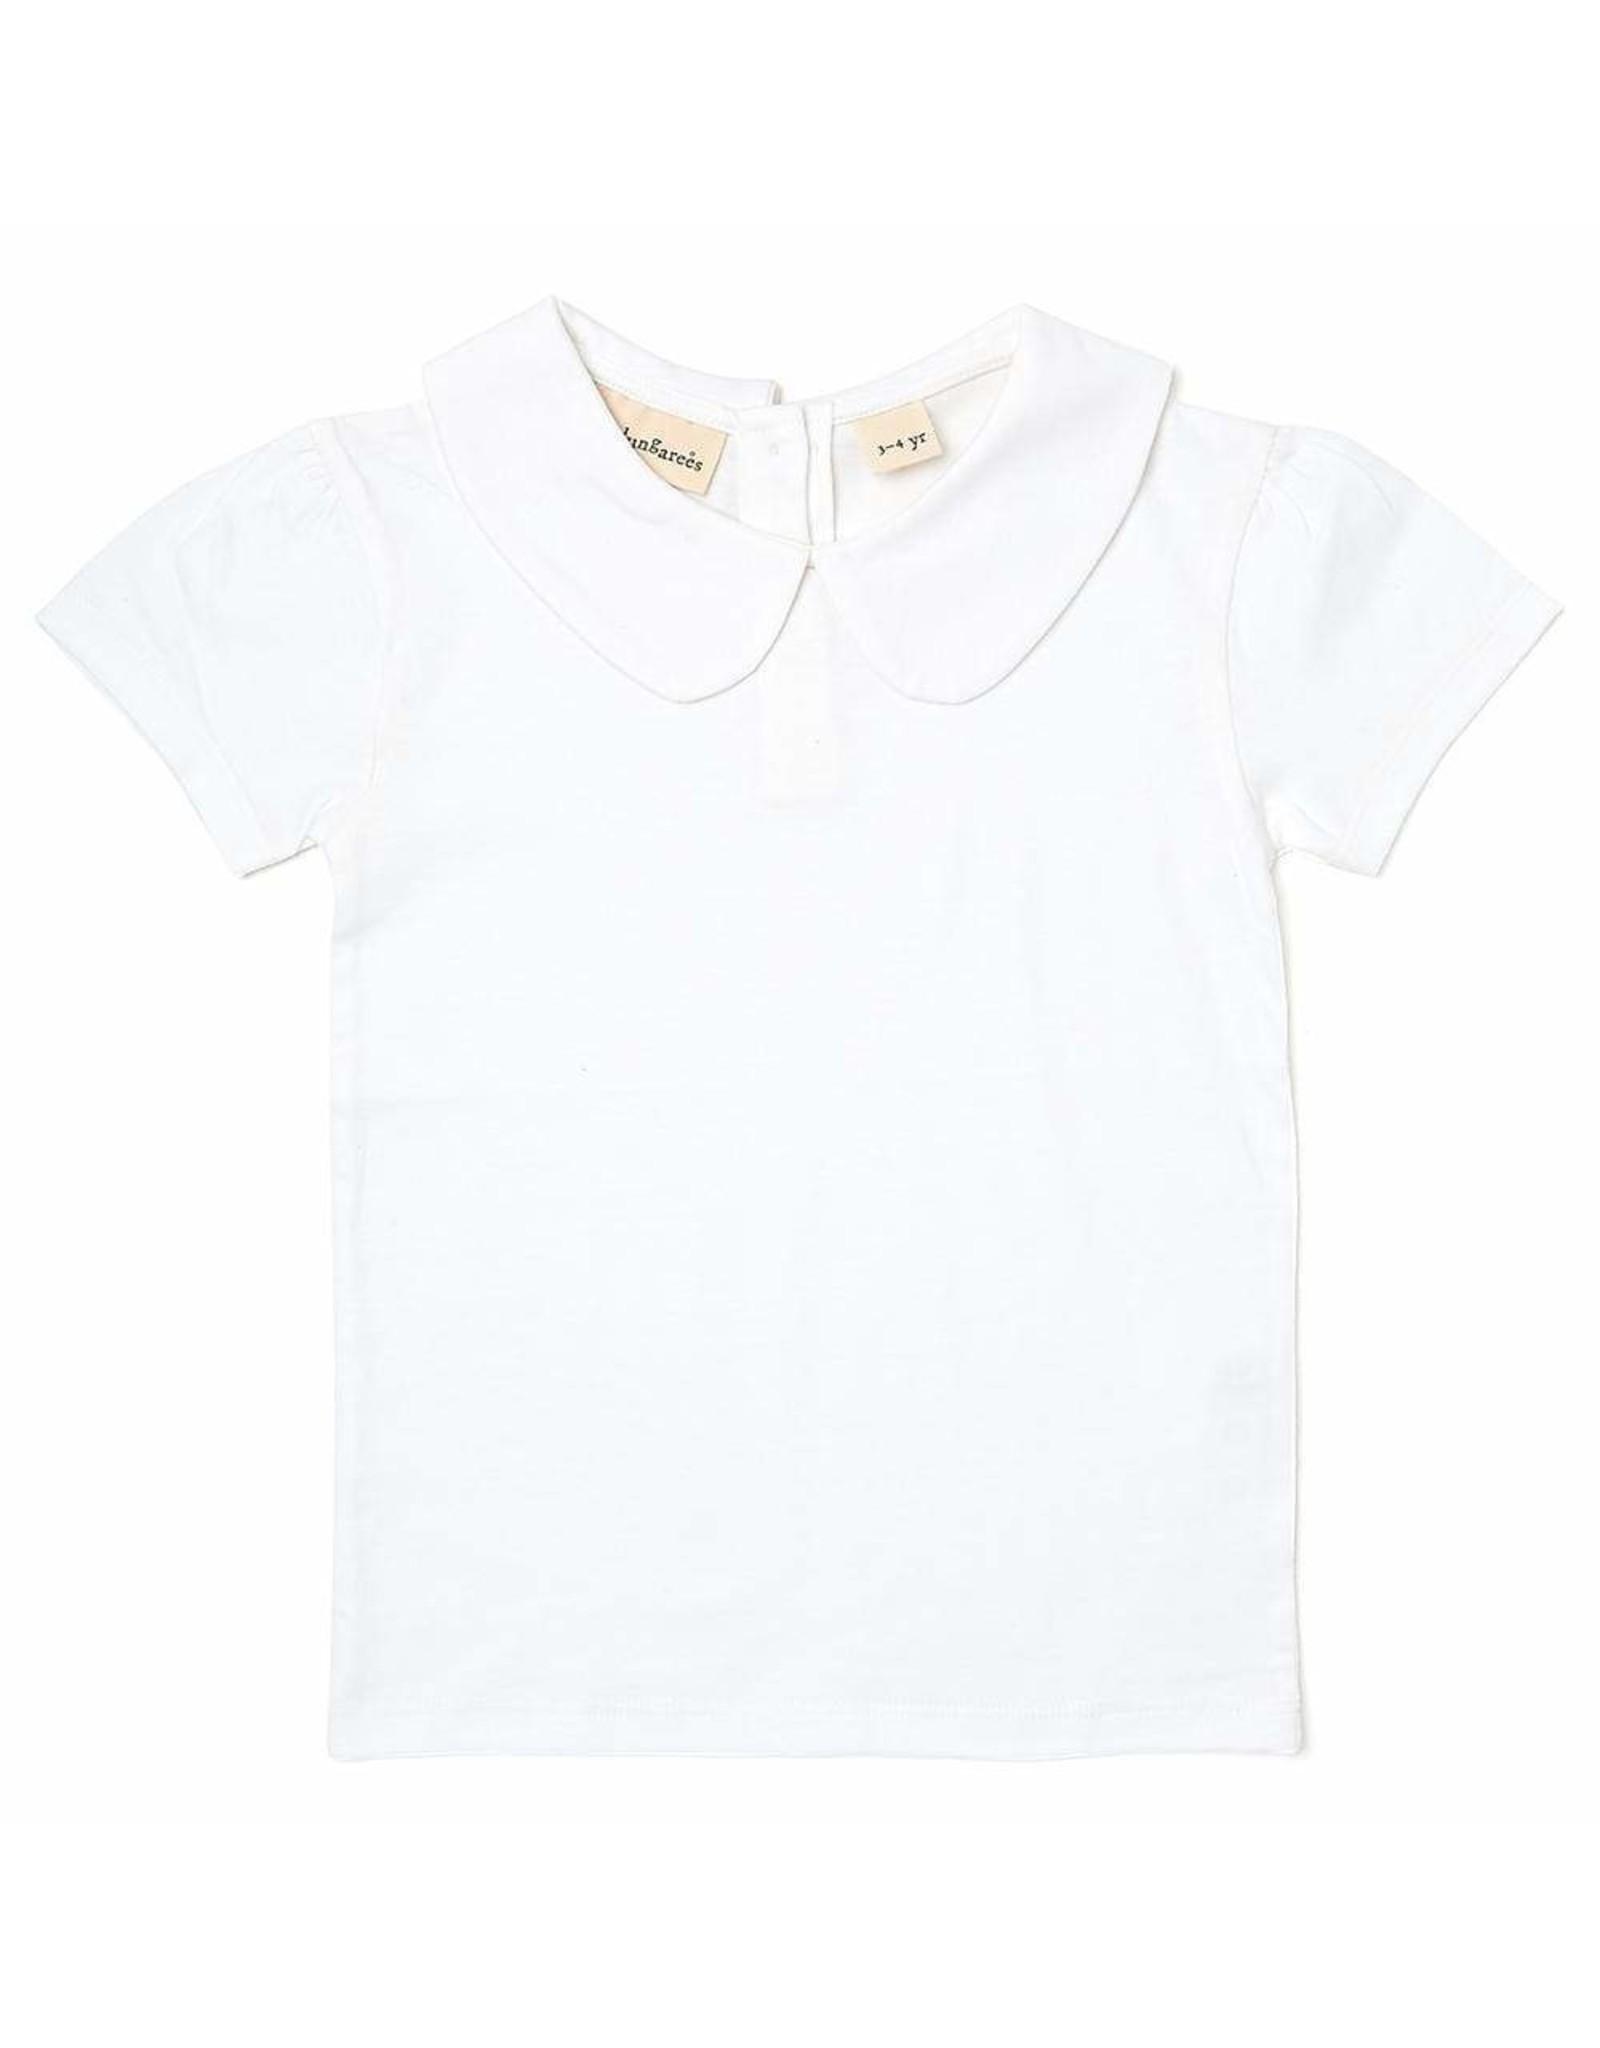 Dotty Dungarees Peter Pan Short Sleeved T Shirt- White- 4-5 Years